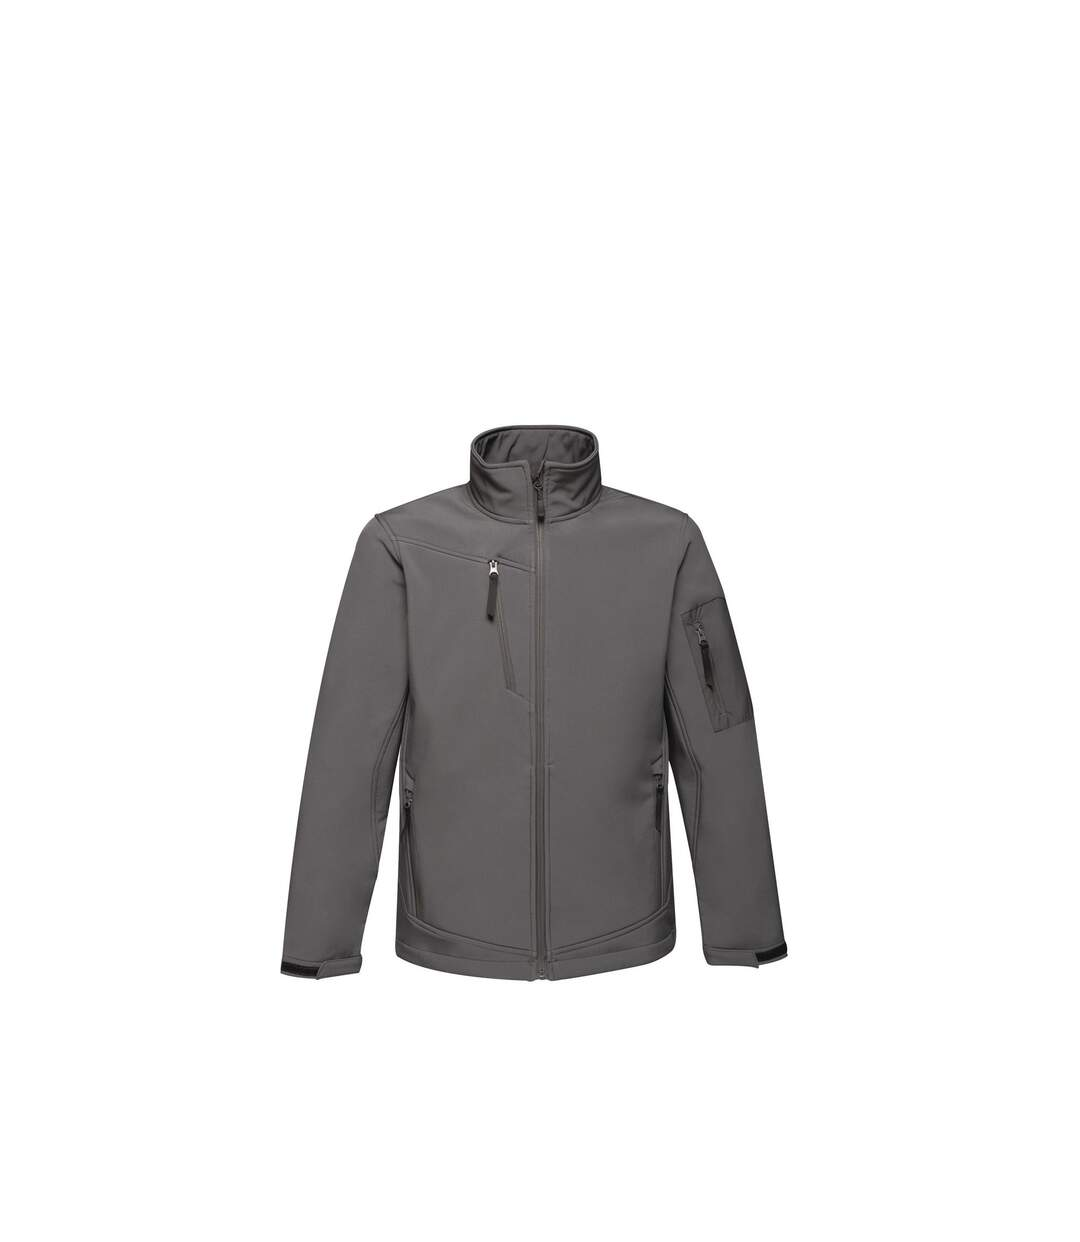 Regatta Standout Mens Arcola 3 Layer Waterproof And Breathable Softshell Jacket (Seal Grey/Black) - UTRG1461